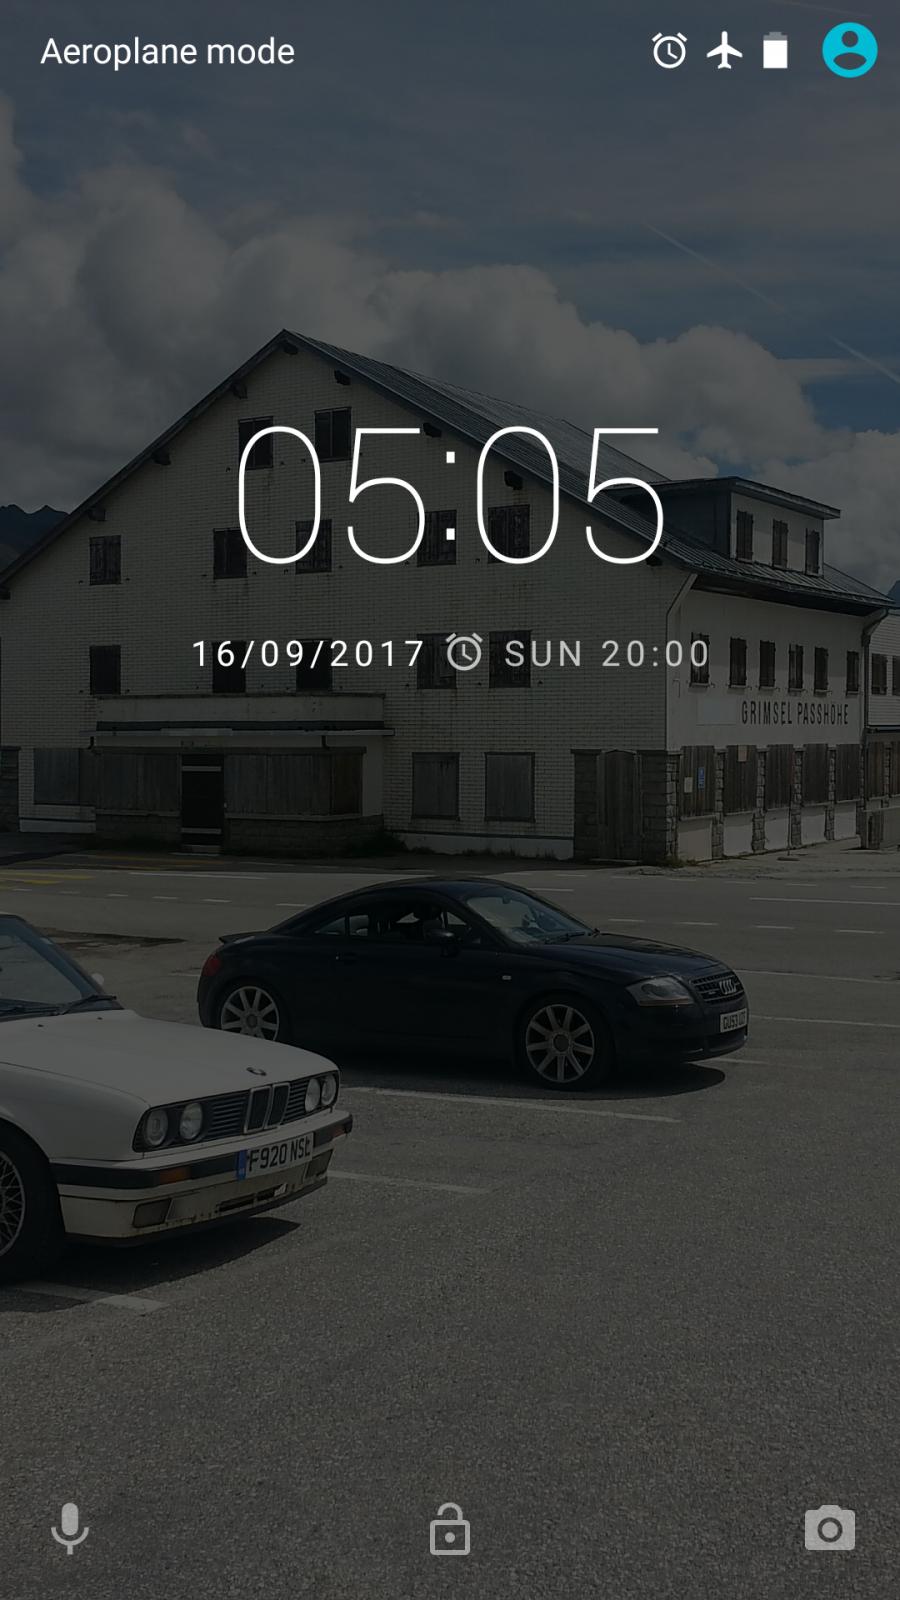 Screenshot_20170916-050556.png